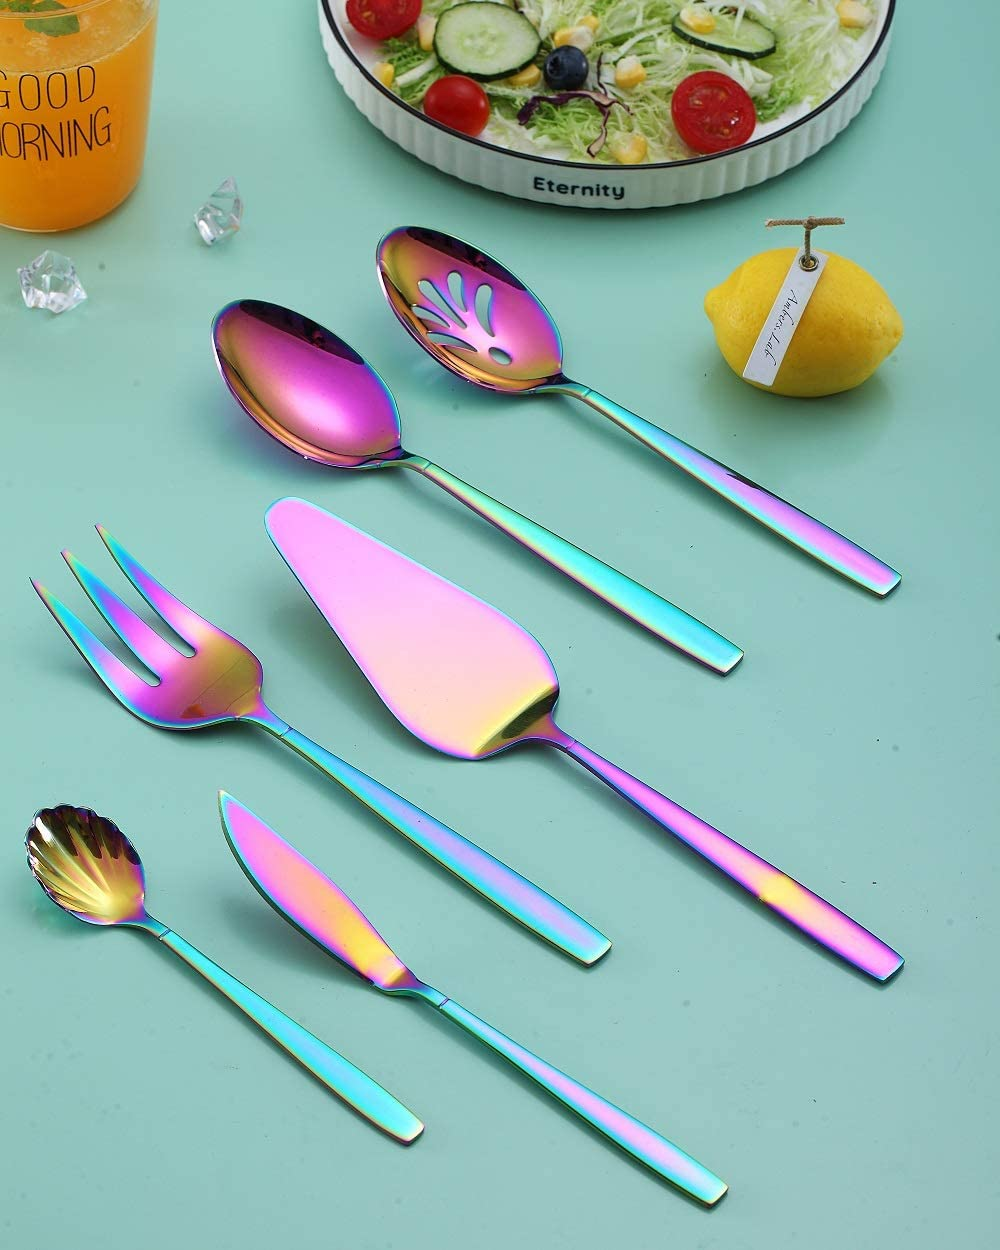 Titanium Plating Rainbow Cutlery Set HOMQUEN  Brand Rainbow Flatware Set 20 Pieces Stainless Steel Colorful Silverware Set Shiny Rainbow Rainbow Utensil Sets Service Set for 4